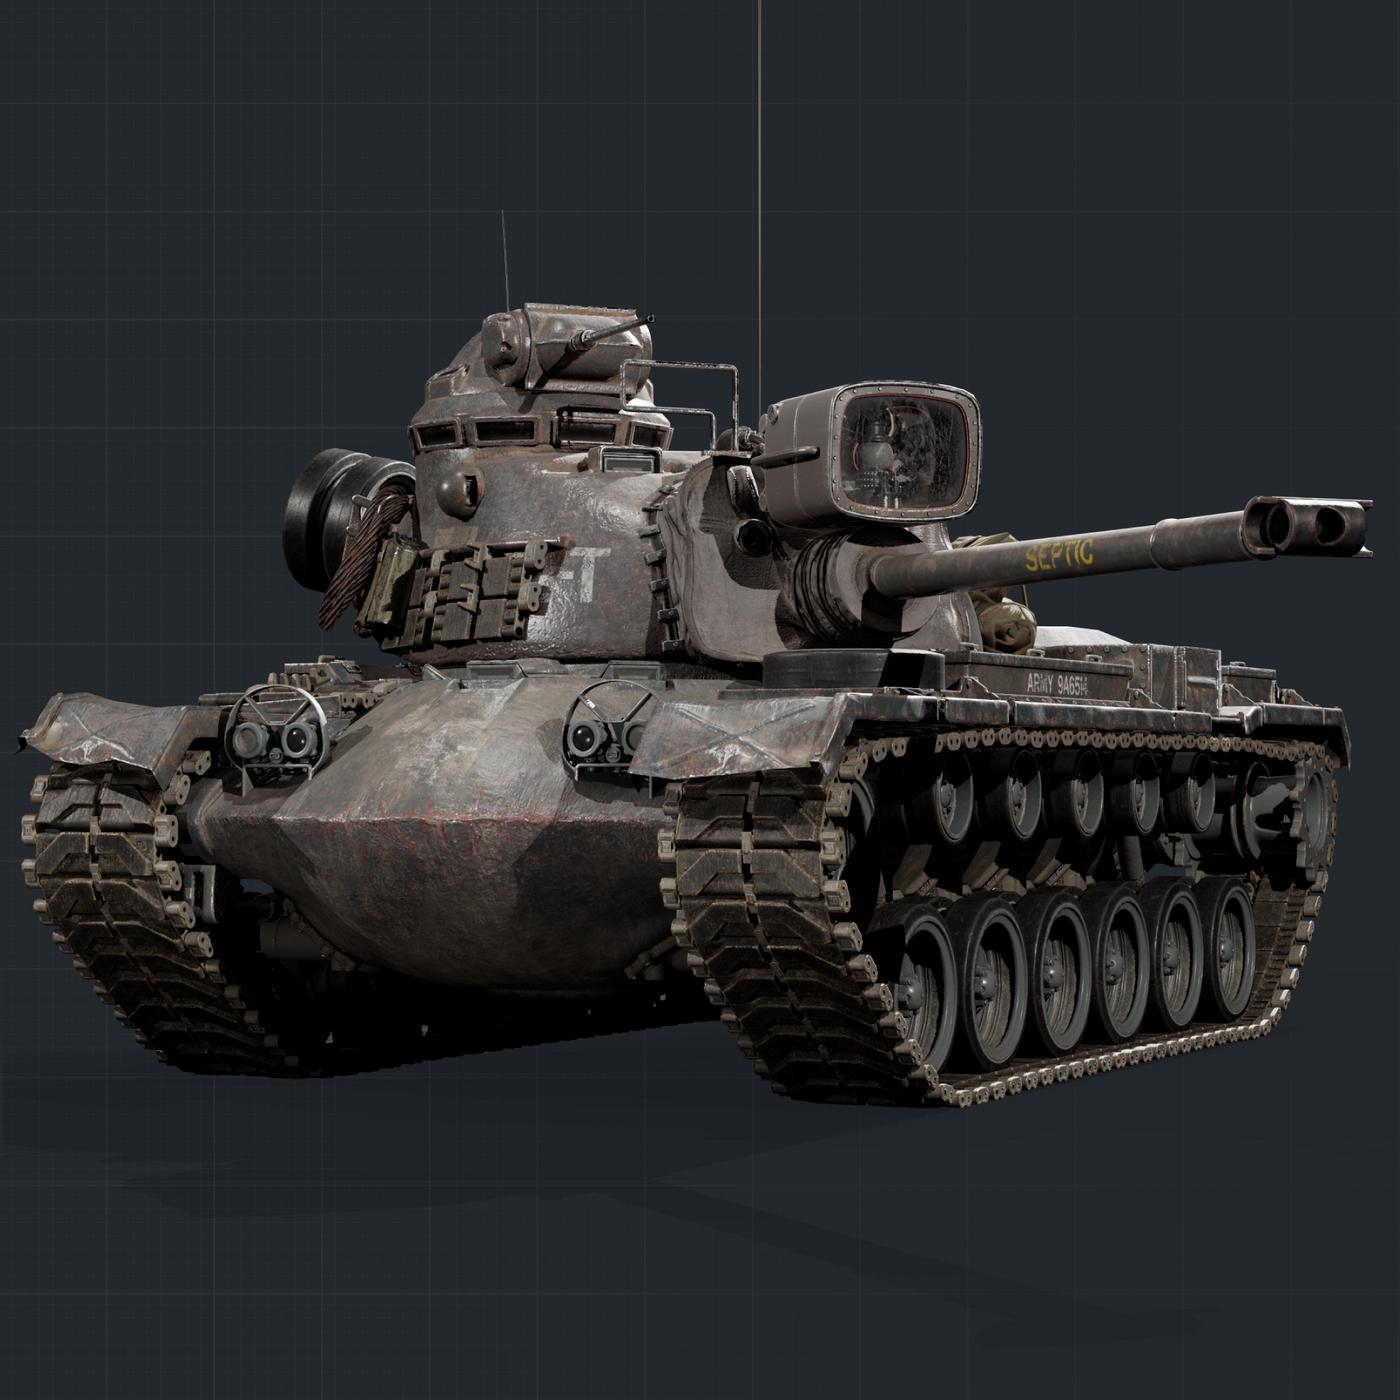 M48 Patton Thumbnail 01 Nortoncmn